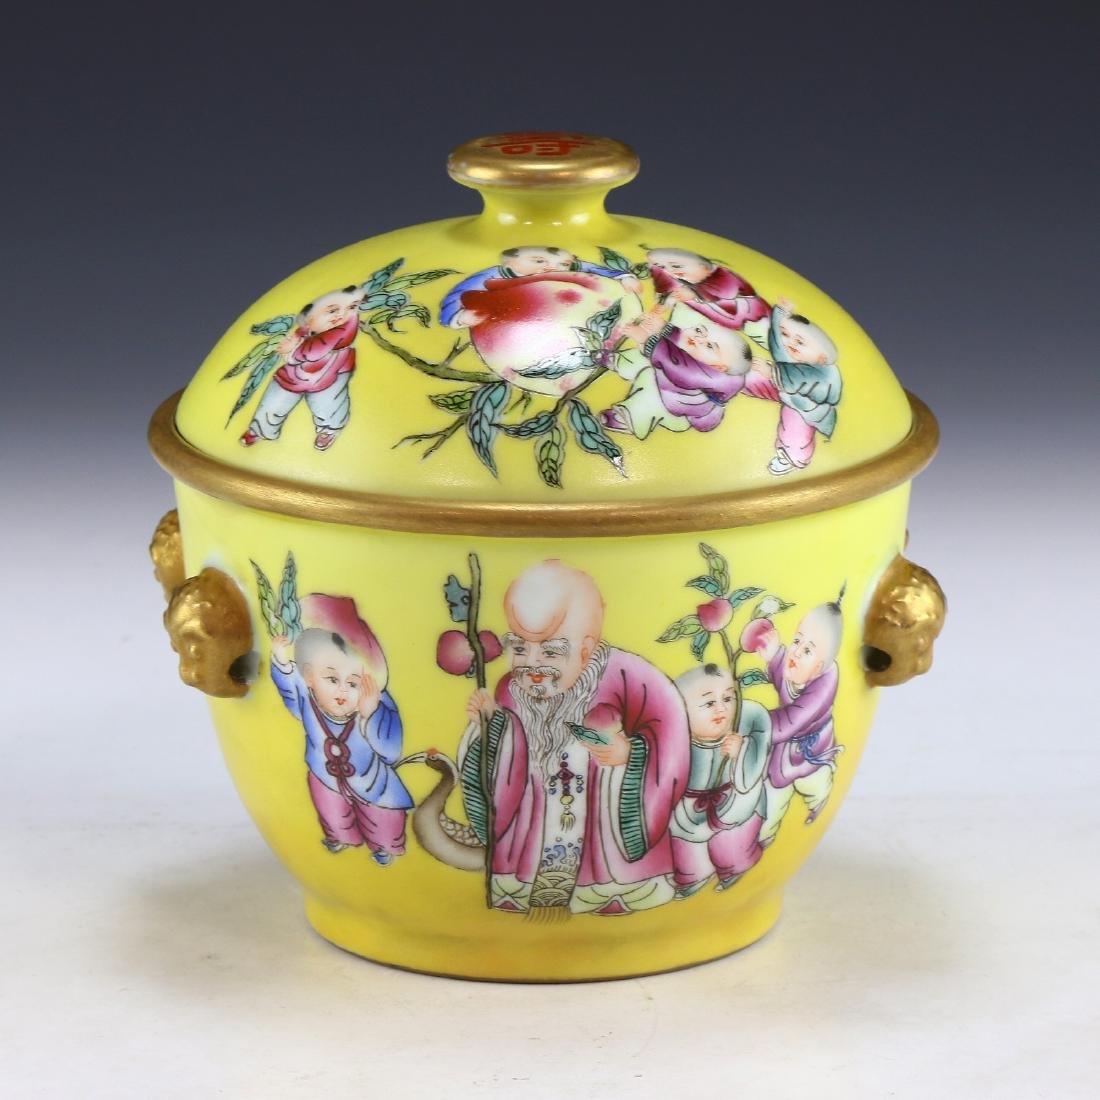 A CHINESE FAMILLE ROSE PORCELAIN LIDDED JAR